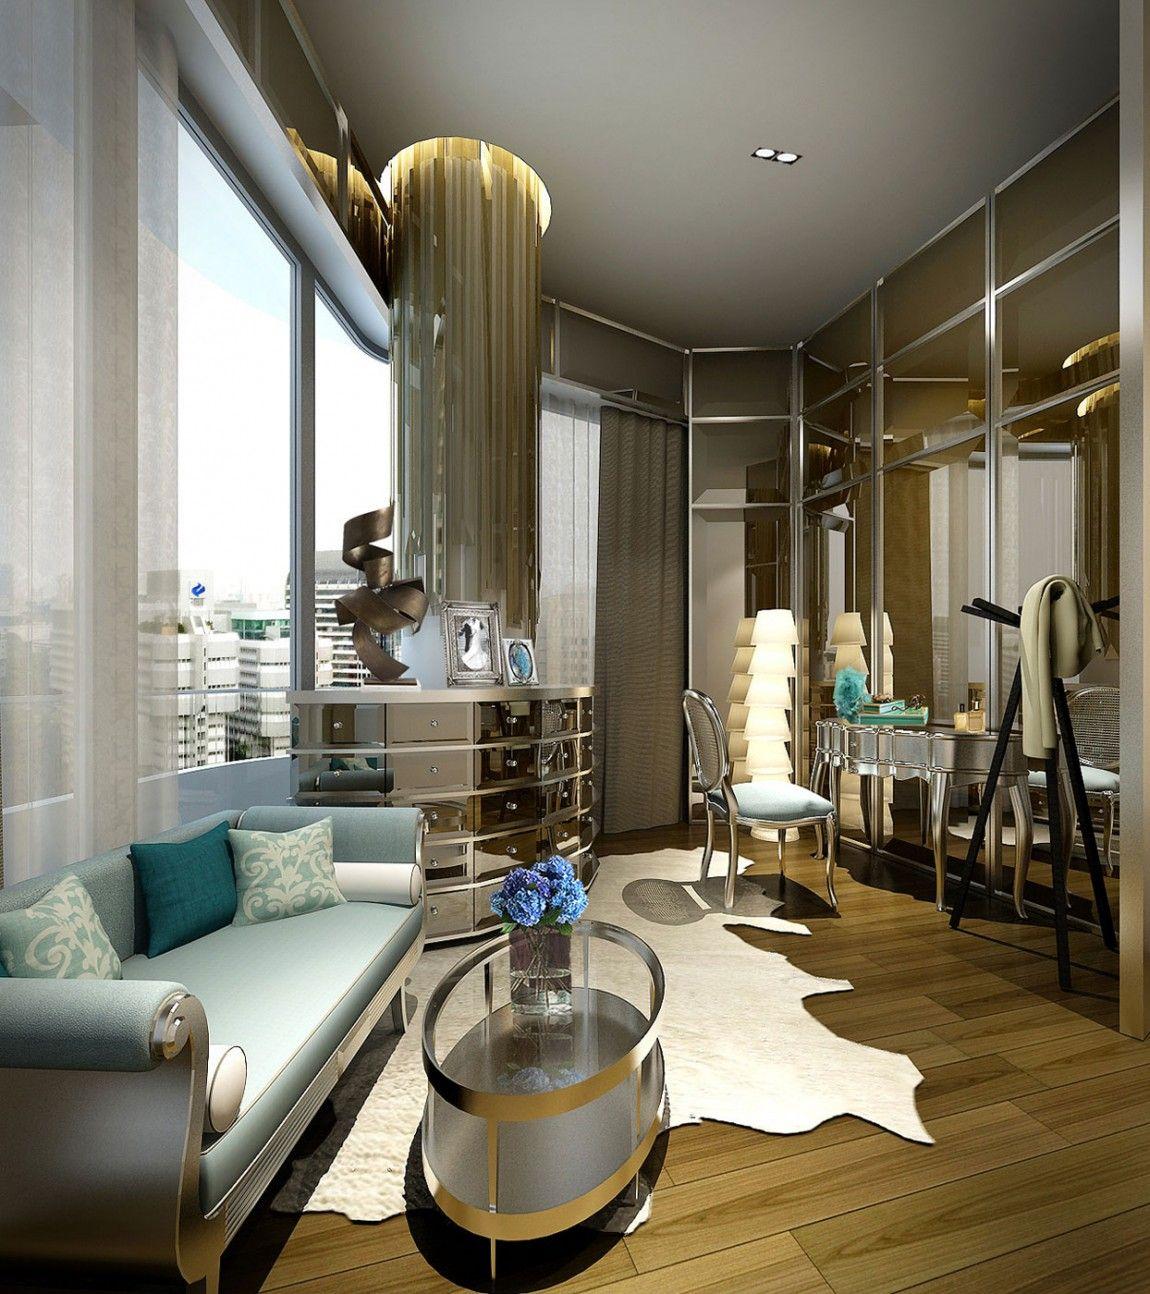 Home Design Expo Singapore: Opulent Show Flat In Grange Infinite Tower, Singapore 40